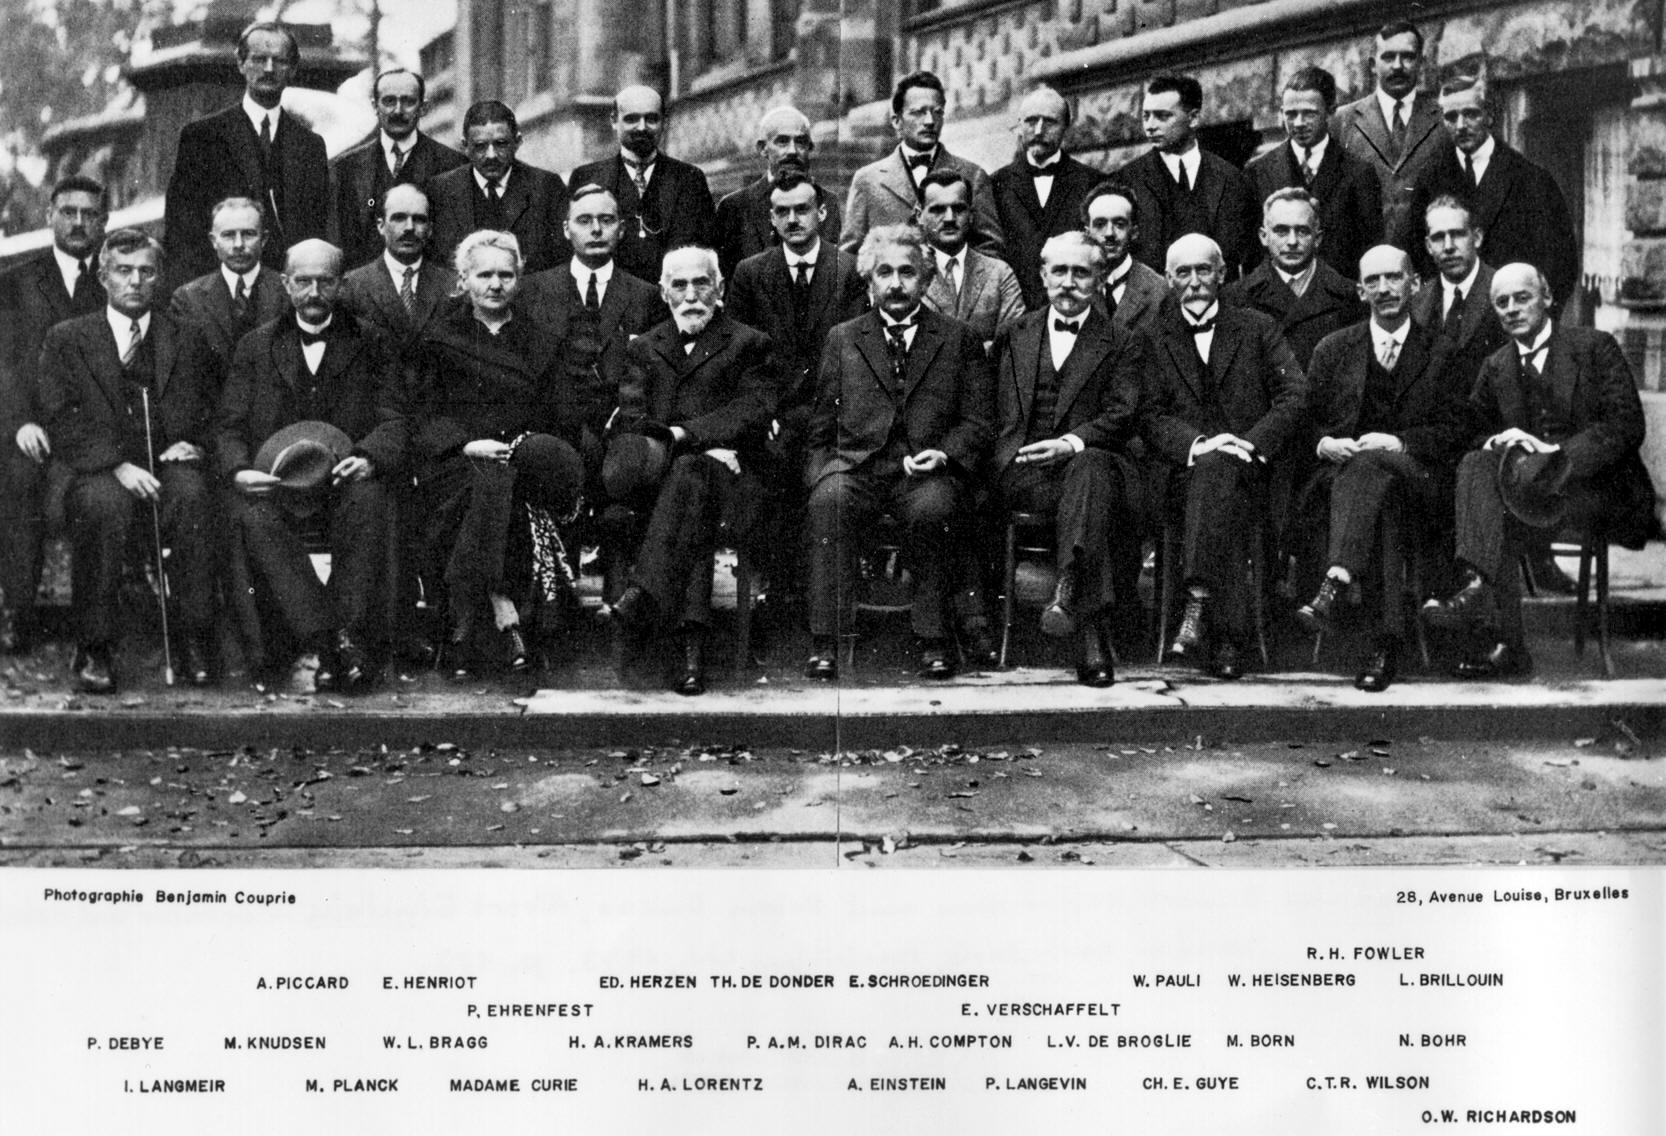 Conferenza di Solvay, 1927